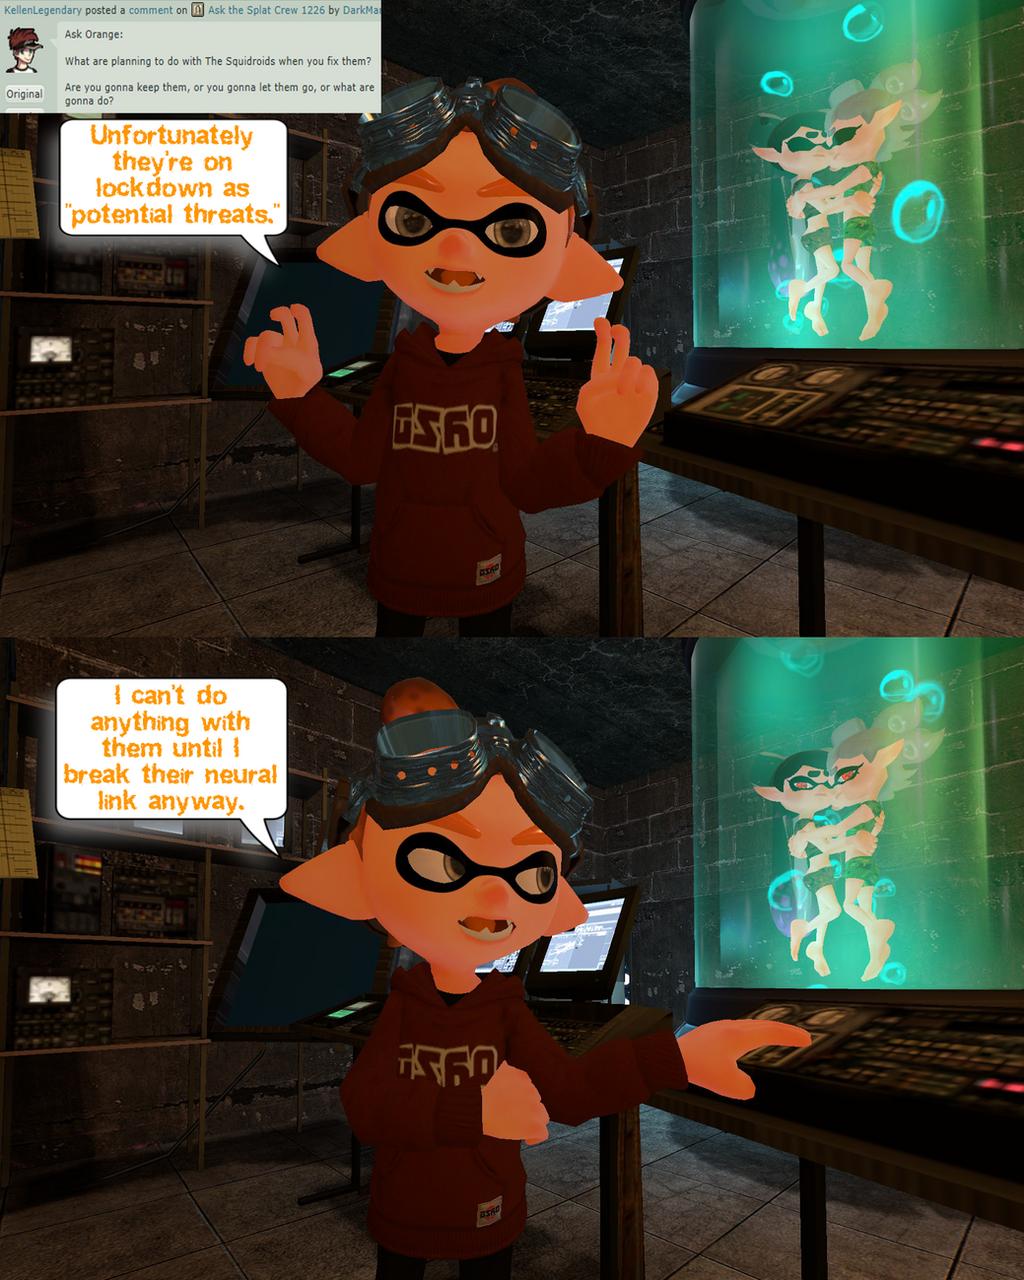 Ask the Splat Crew 1242 by DarkMario2